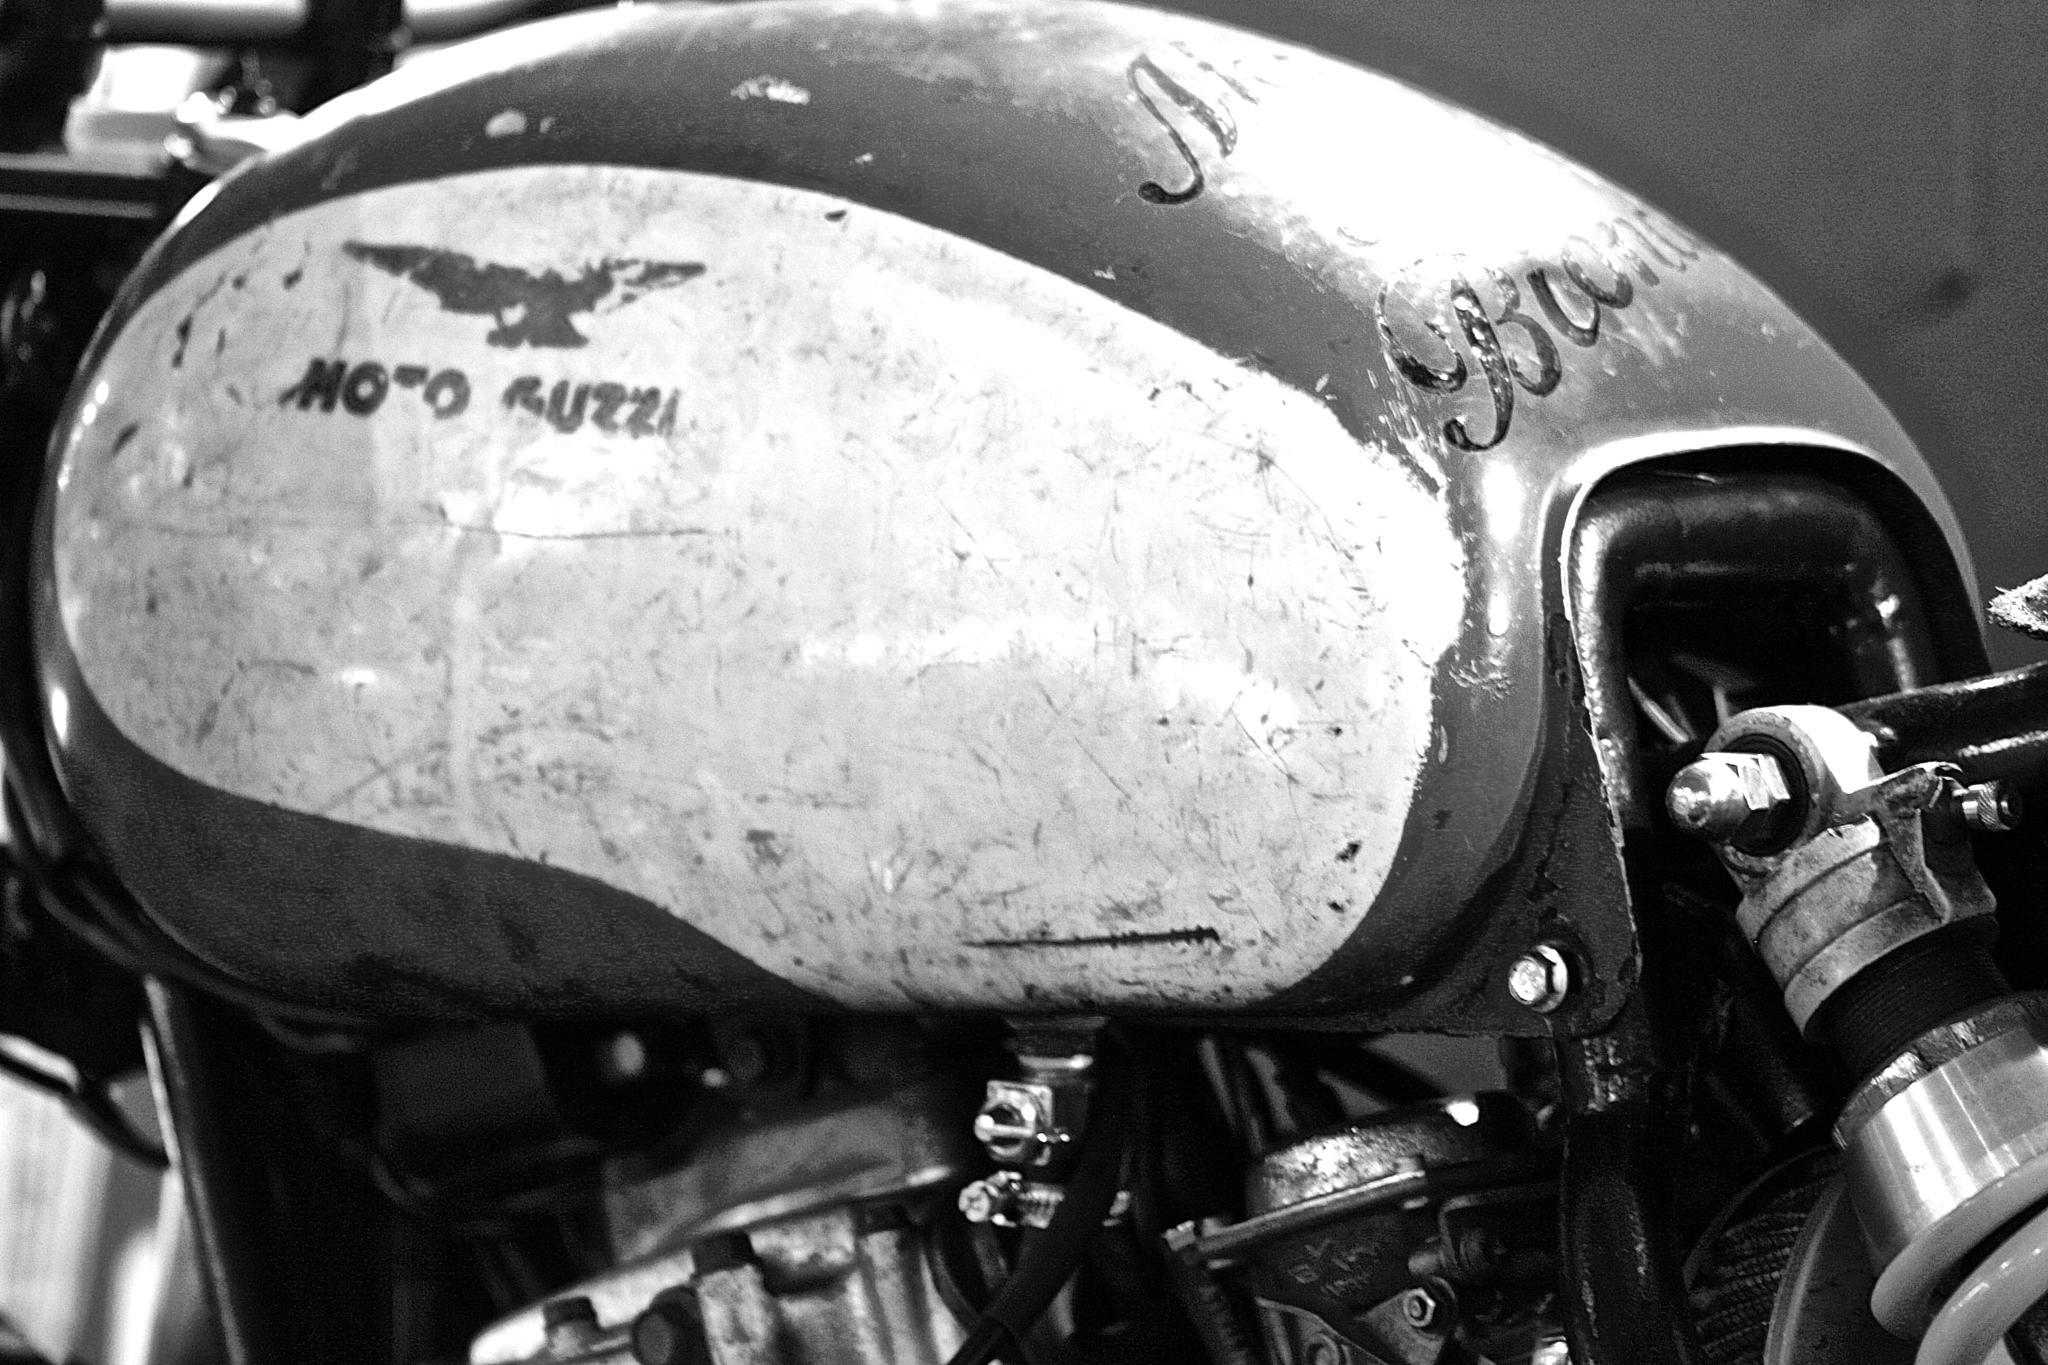 Moto Guzzi by Owiba Riccardo Faini